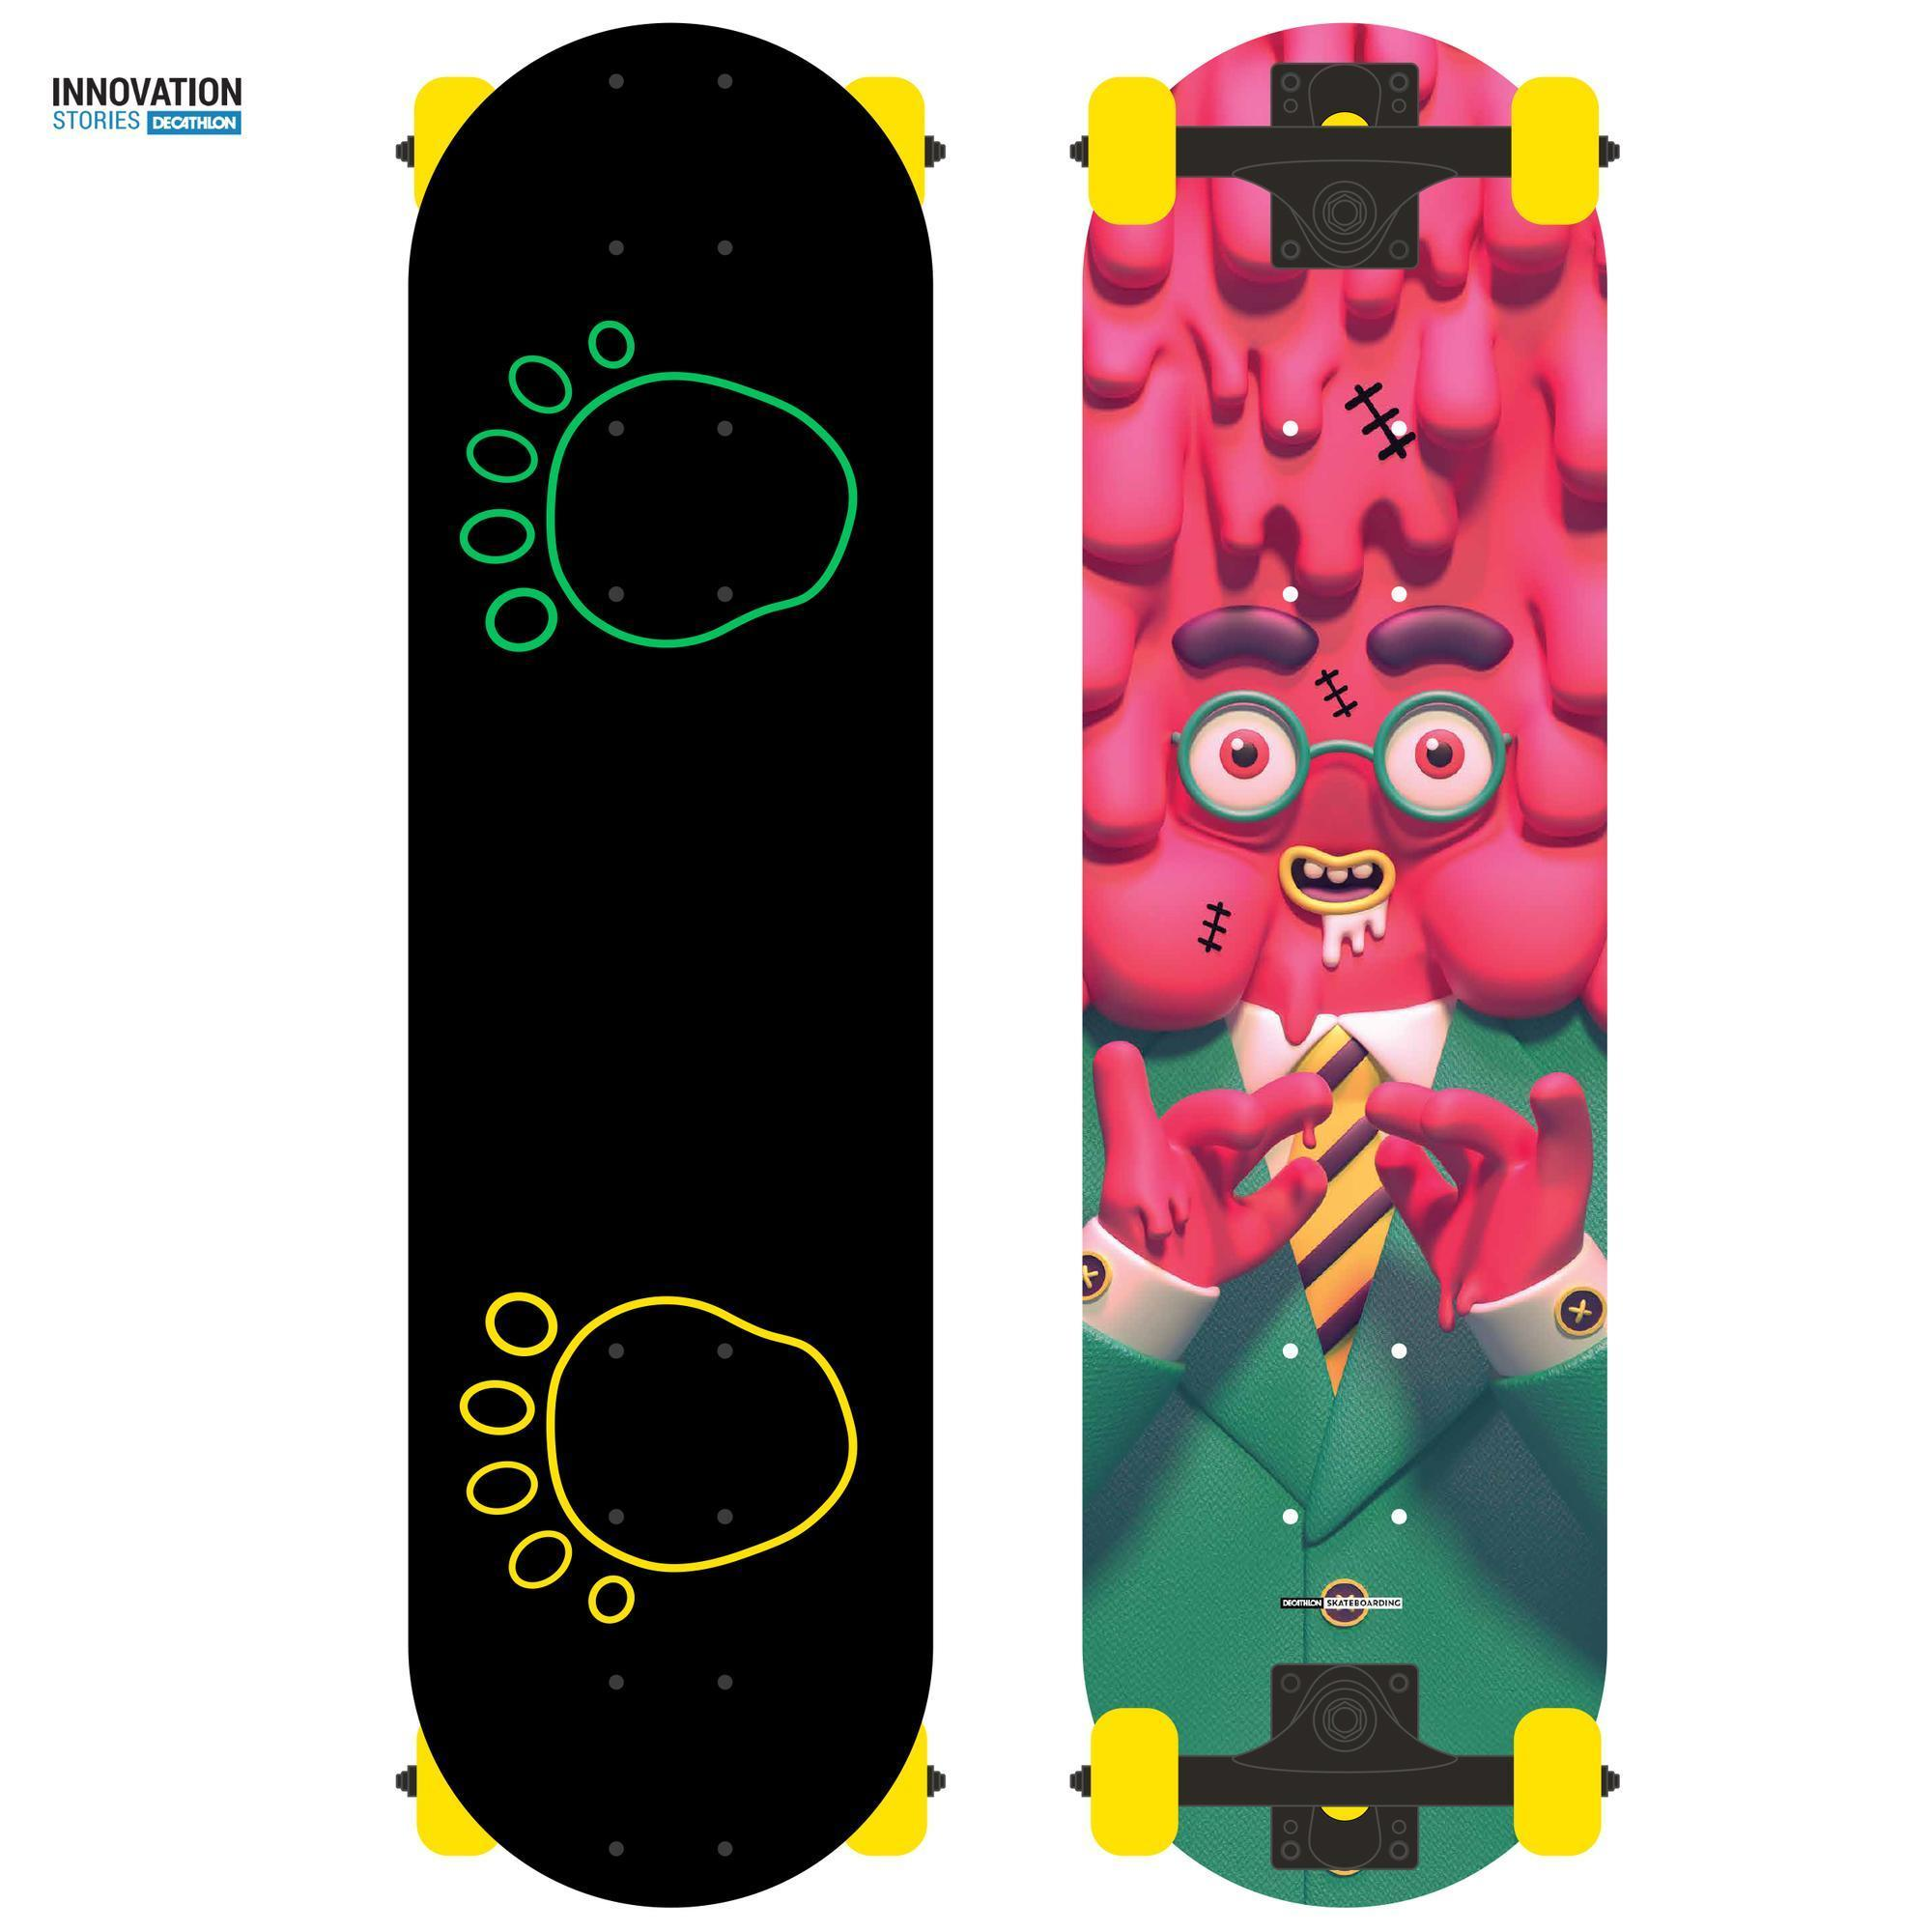 f6e01d31cb0 Comprar Tablas de Skate online   Decathlon